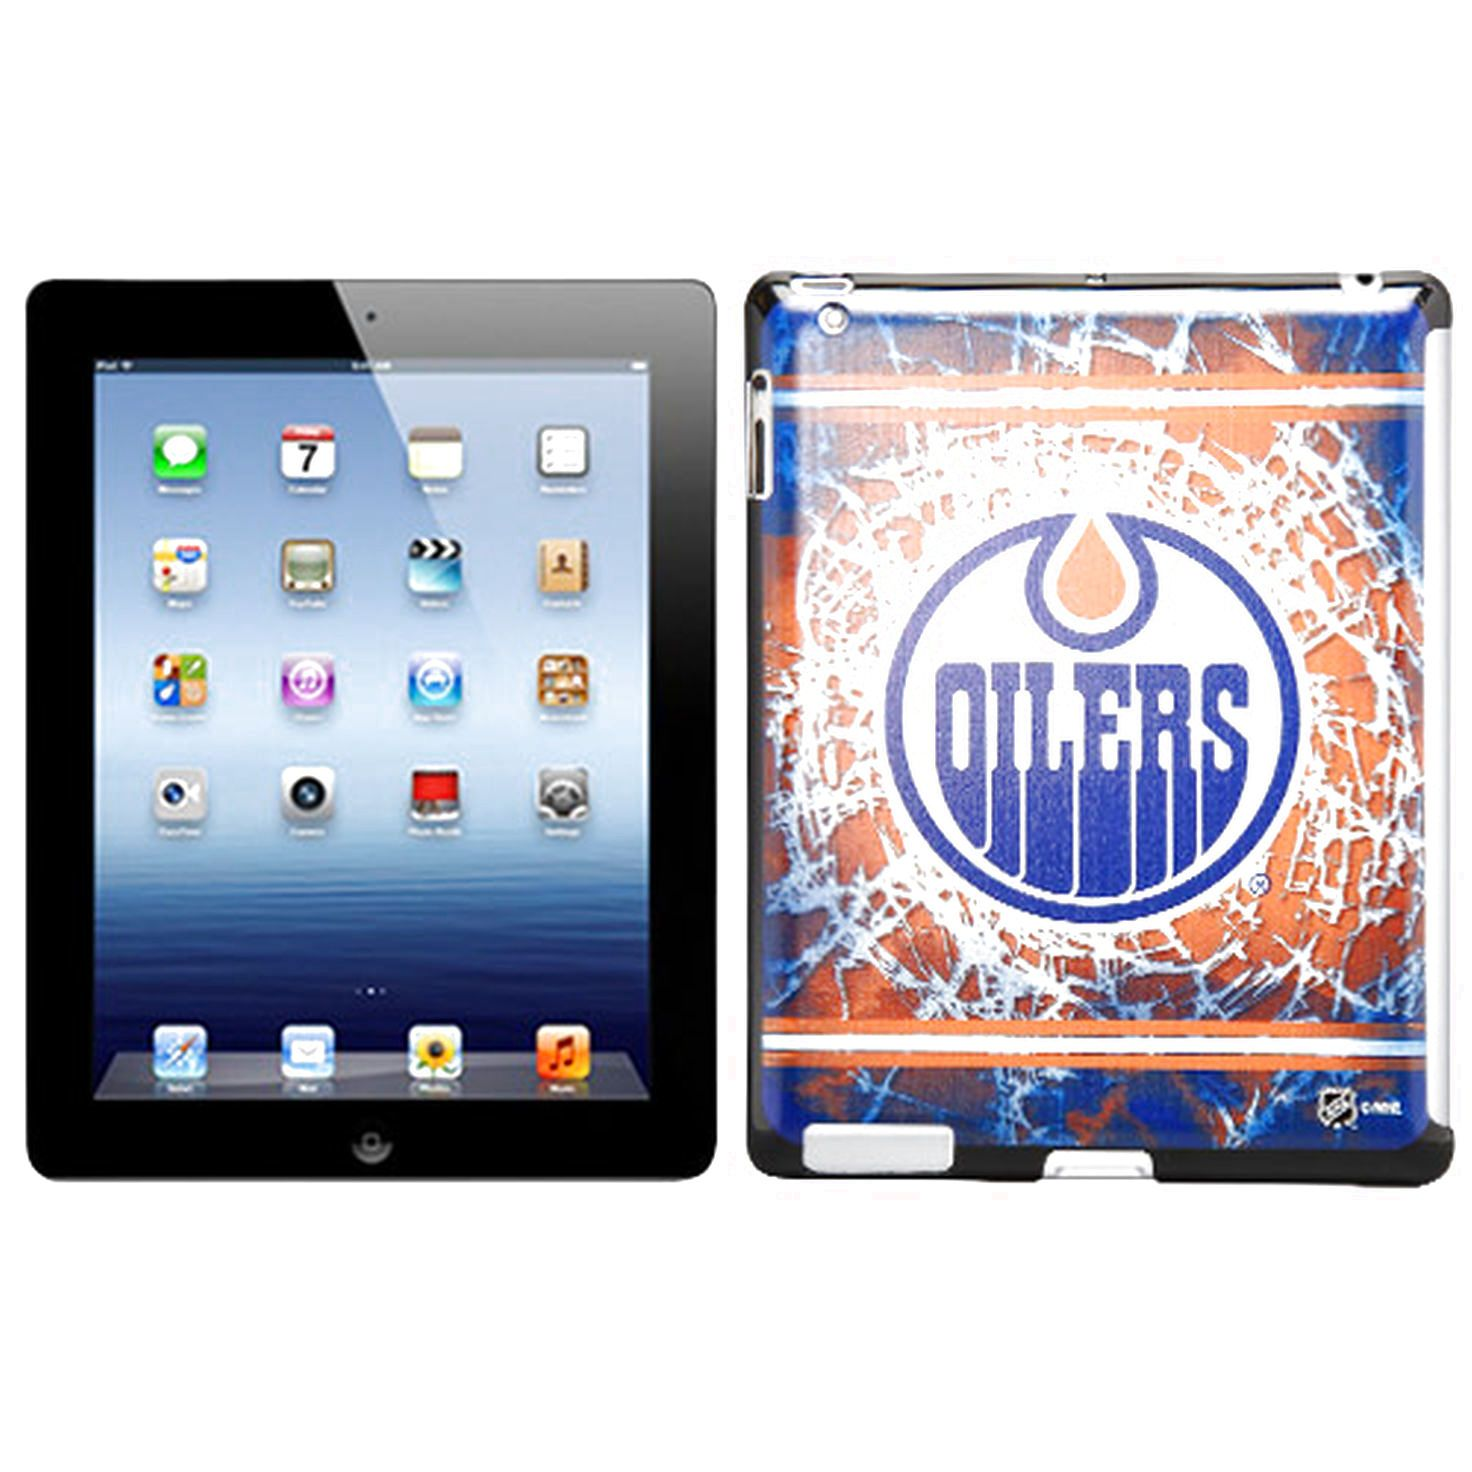 Edmonton Oilers iPad 3 Cover - $31.99